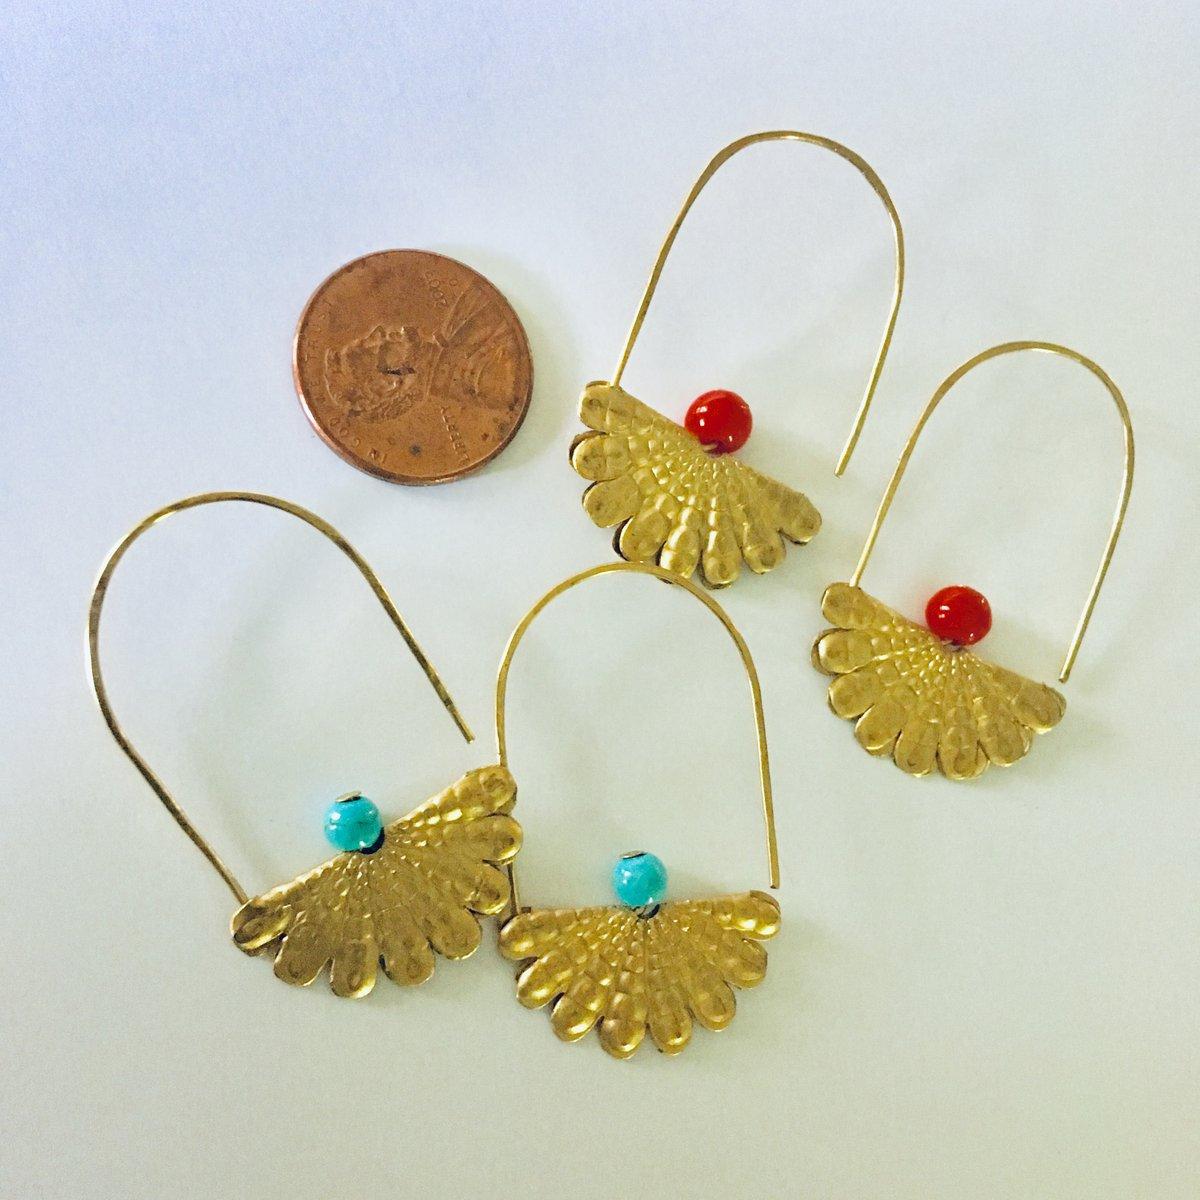 Image of Squash Blossom Earrings